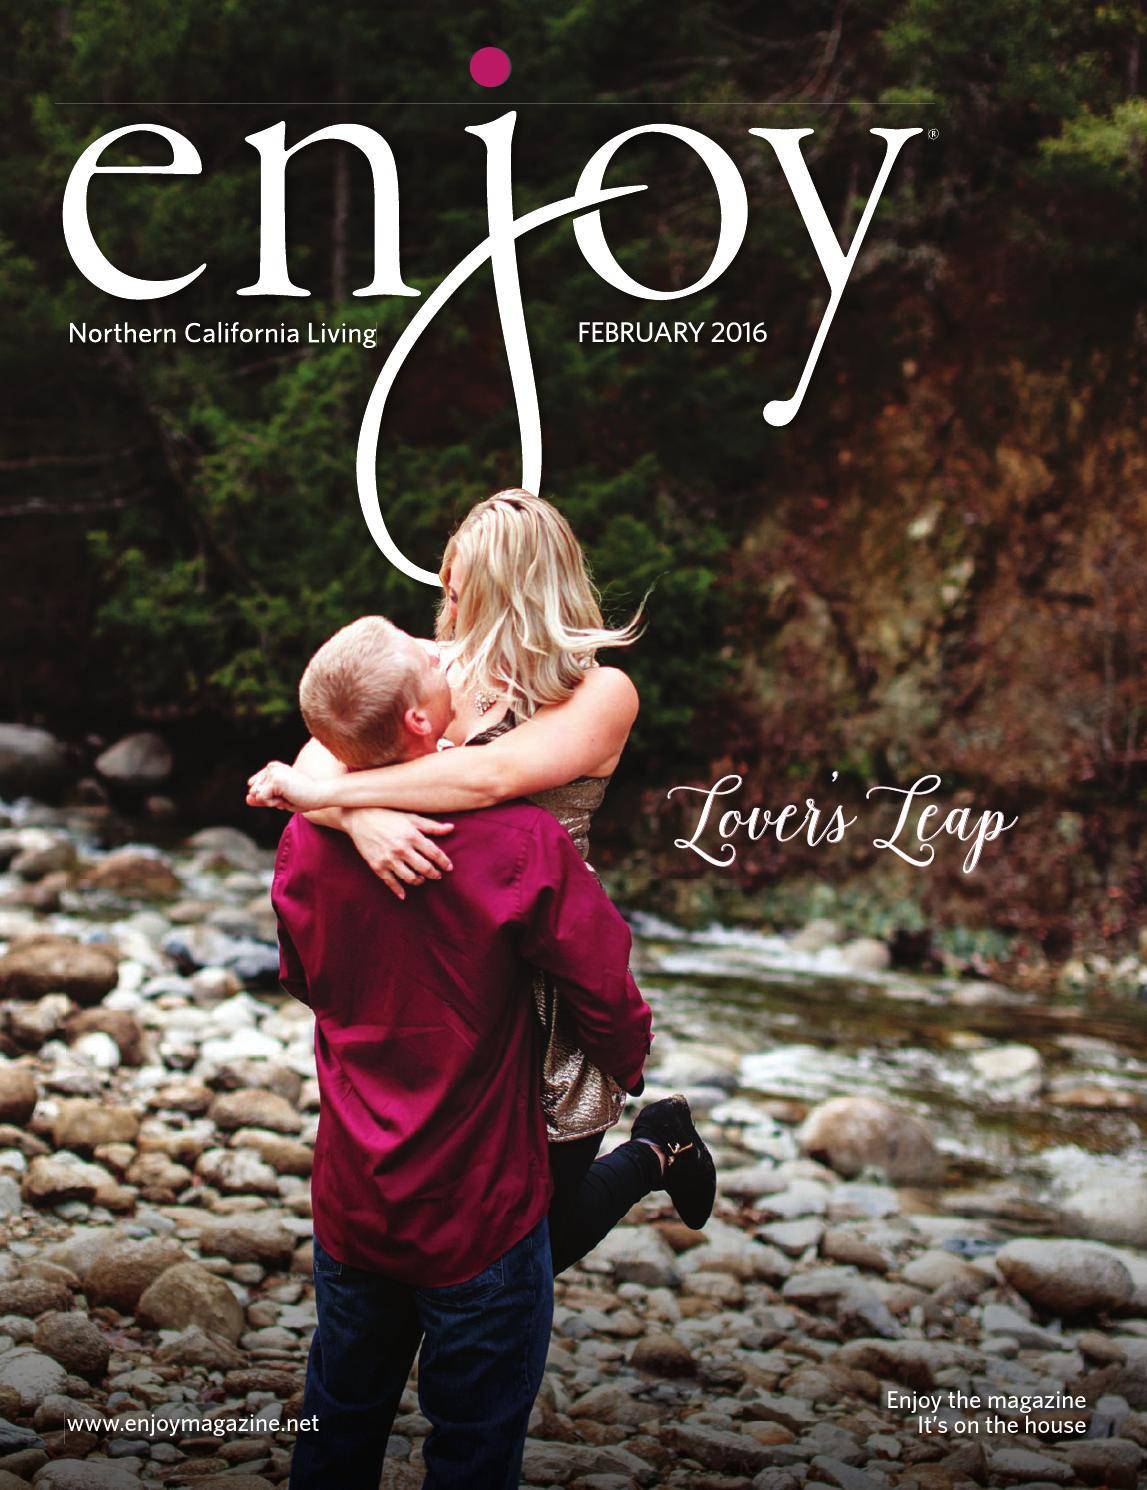 Enjoy Magazine Northern California Living February 2016